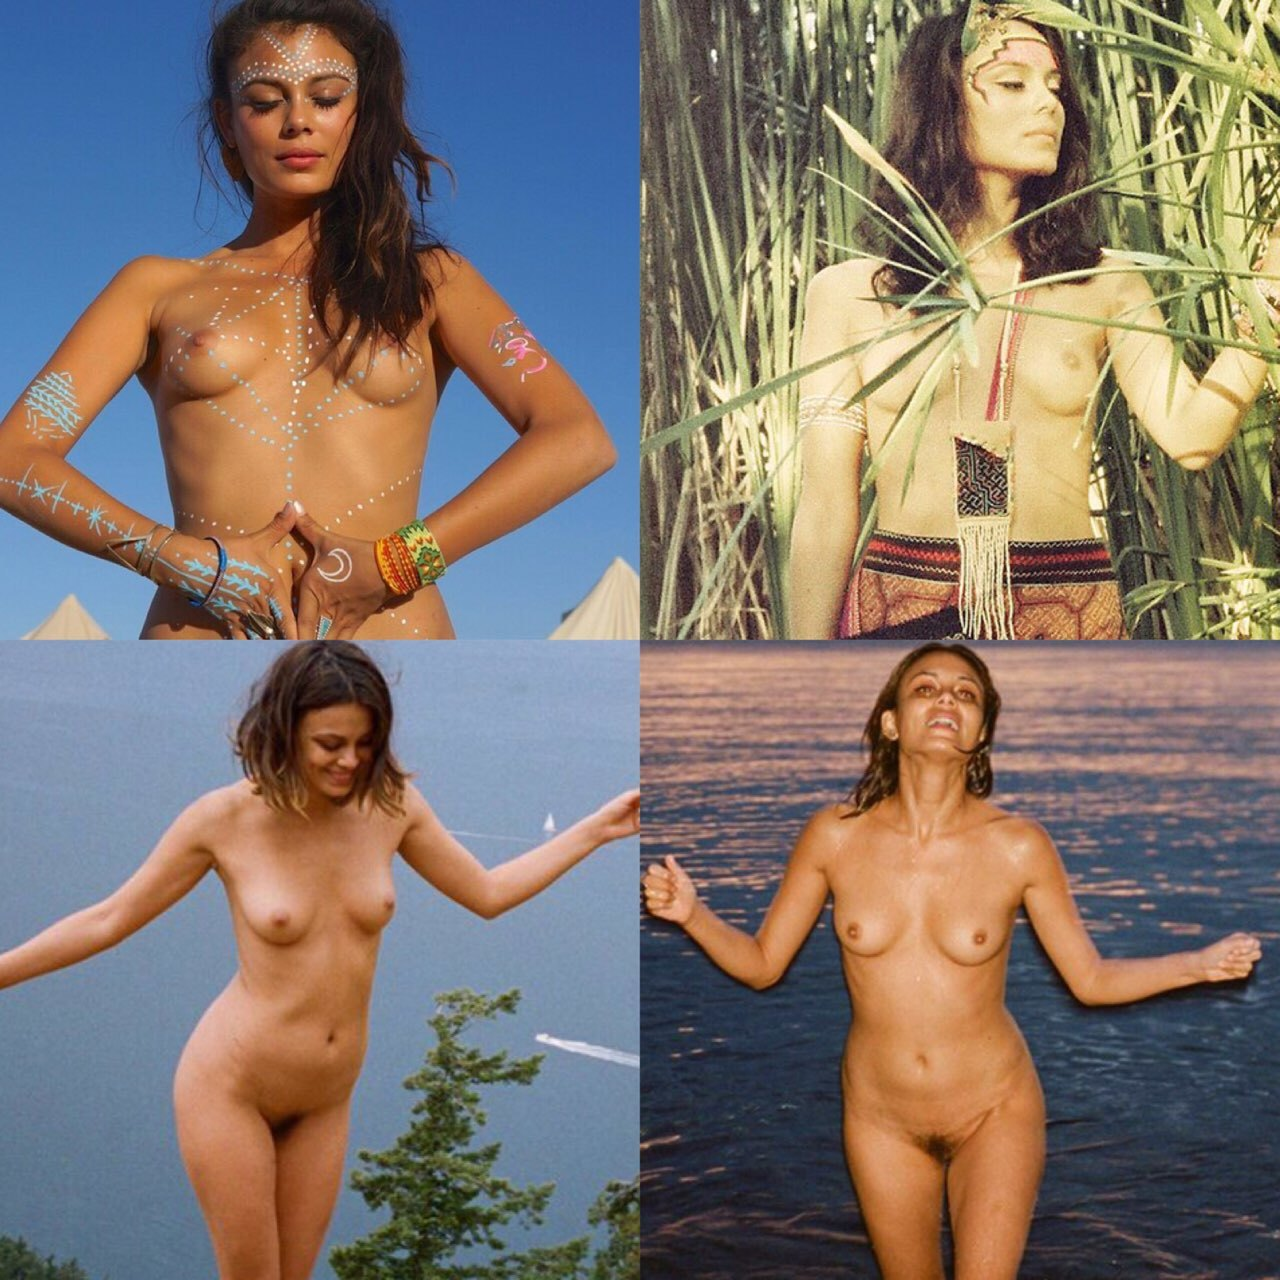 Nathalie kelley gets nude in nature